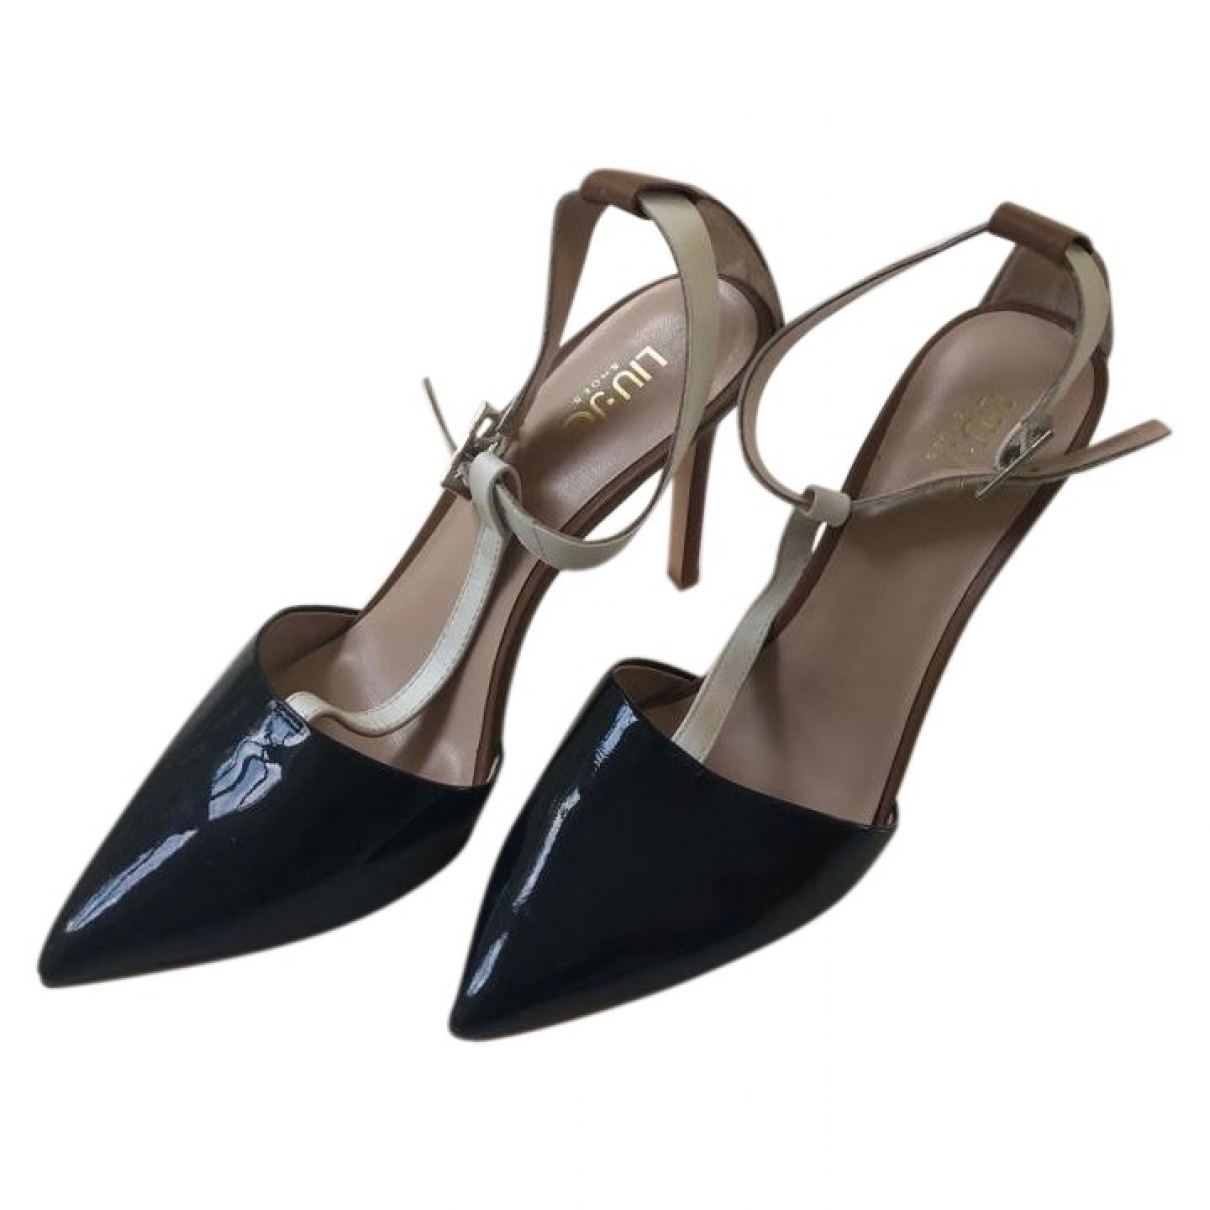 Liu.jo \N Black Patent leather Heels for Women 39 EU